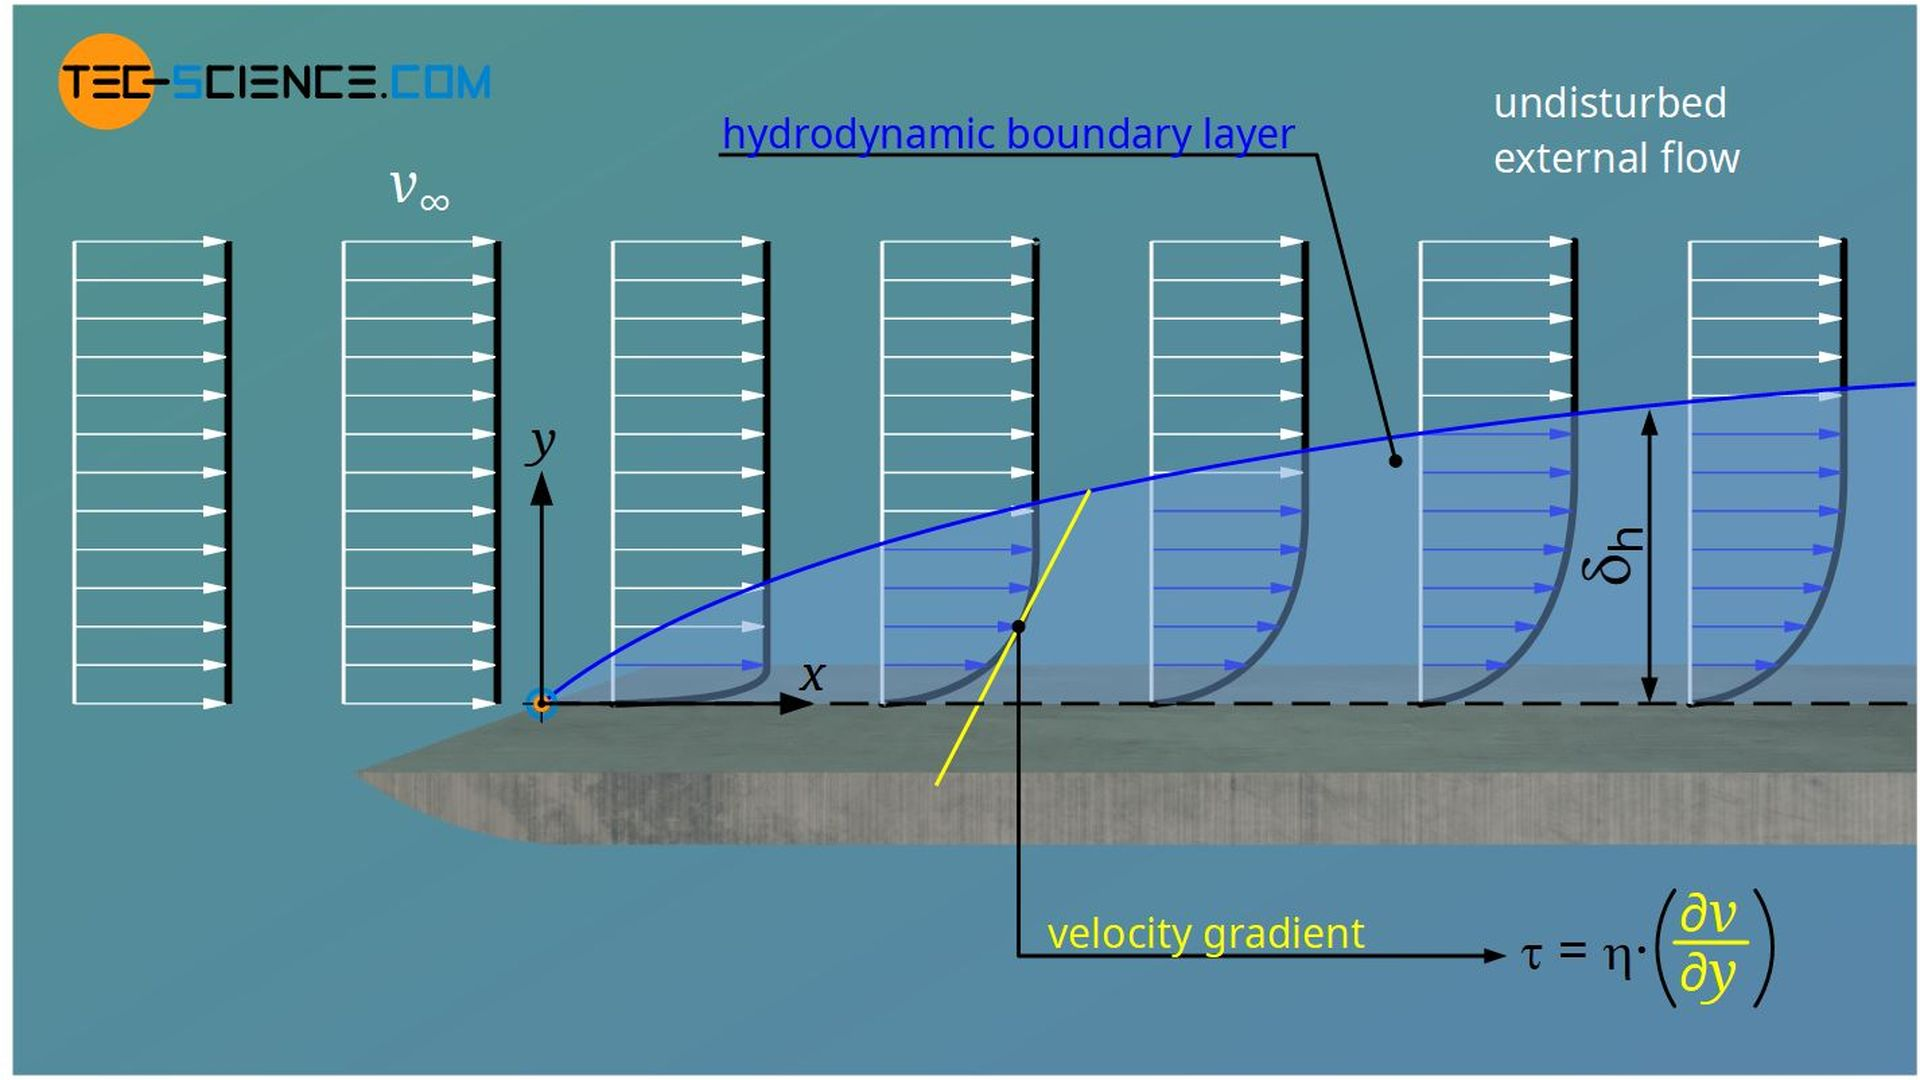 Definition of the hydrodynamic boundary layer (velocity boundary layer)